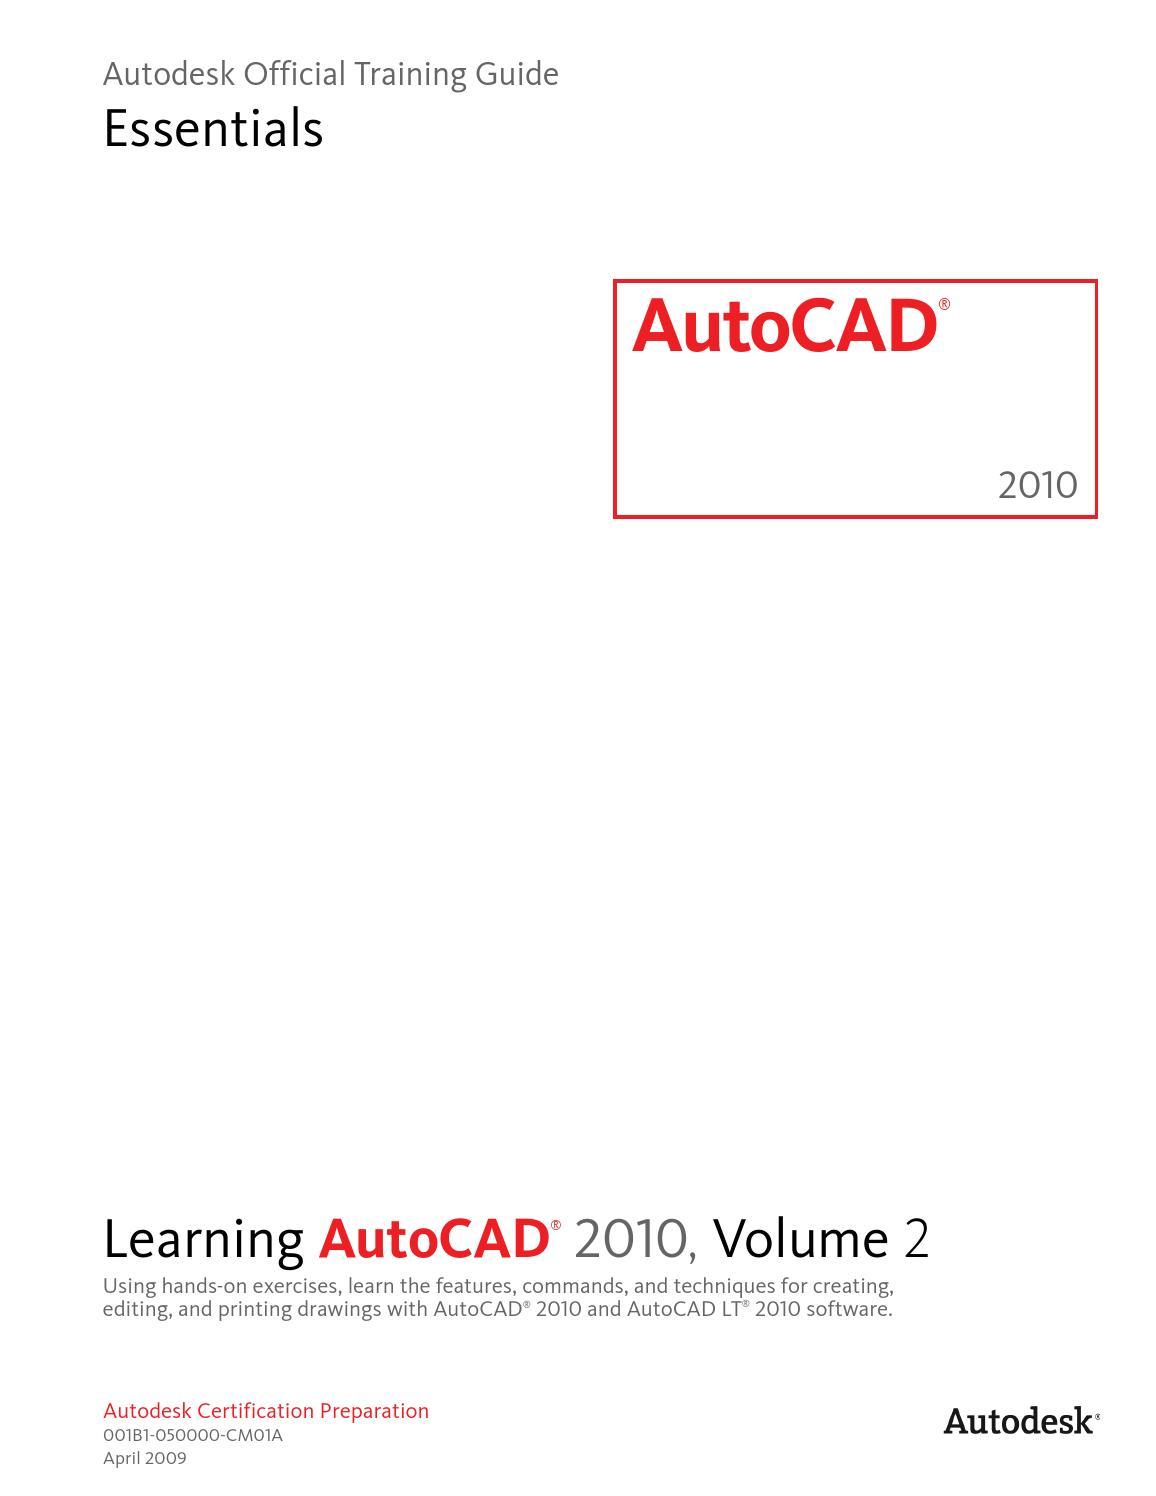 Learning autocad 2010 volume 2 by Goga - issuu